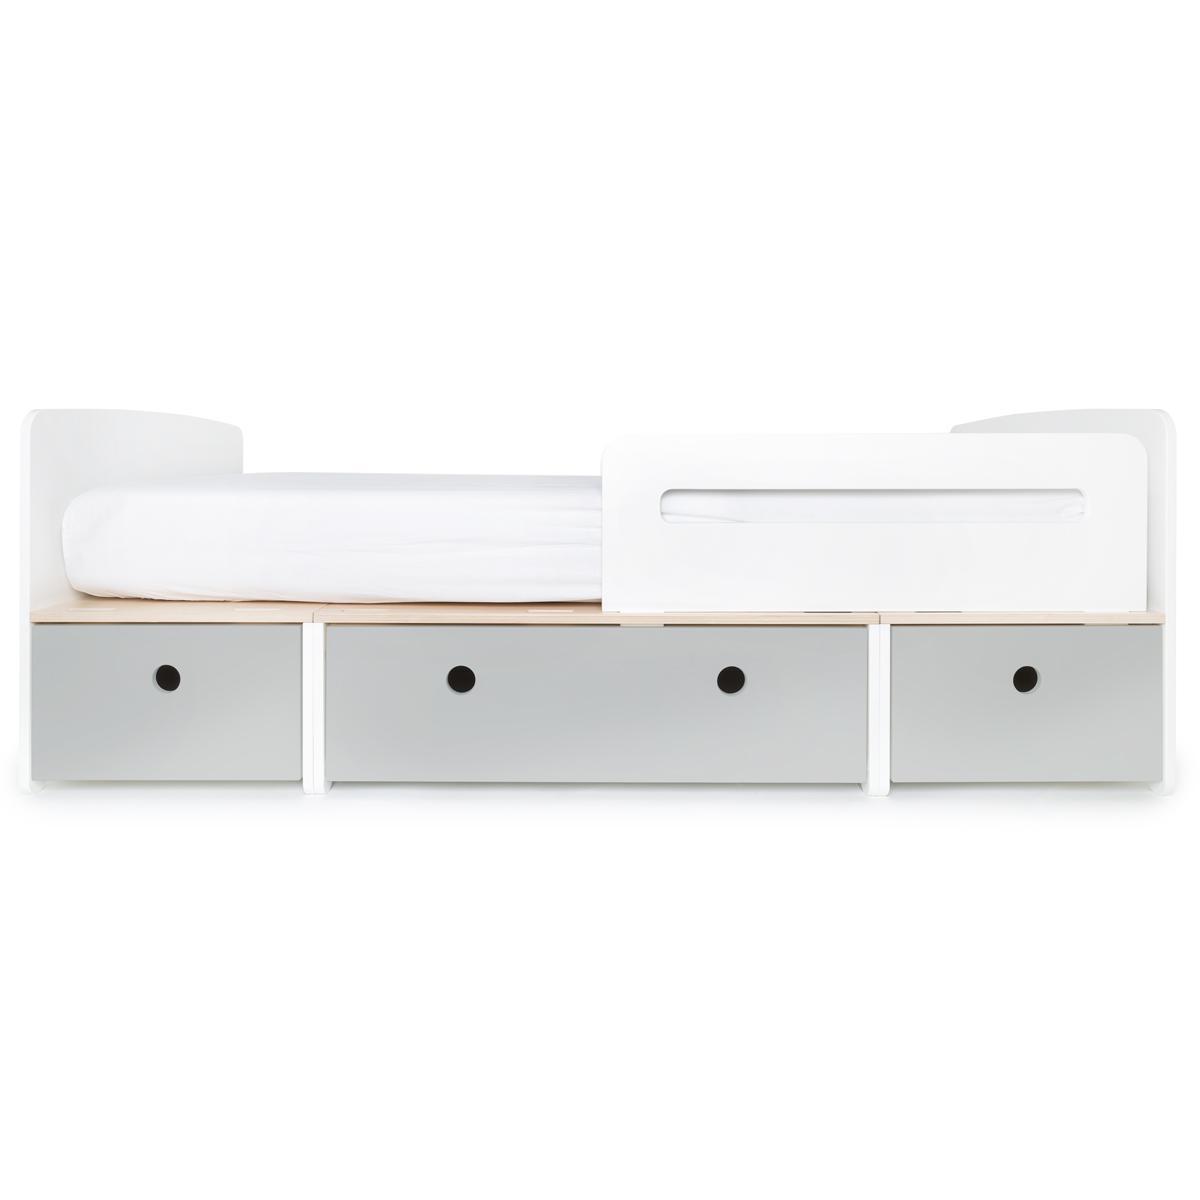 Kinderbett 90x200cm COLORFLEX pearl grey